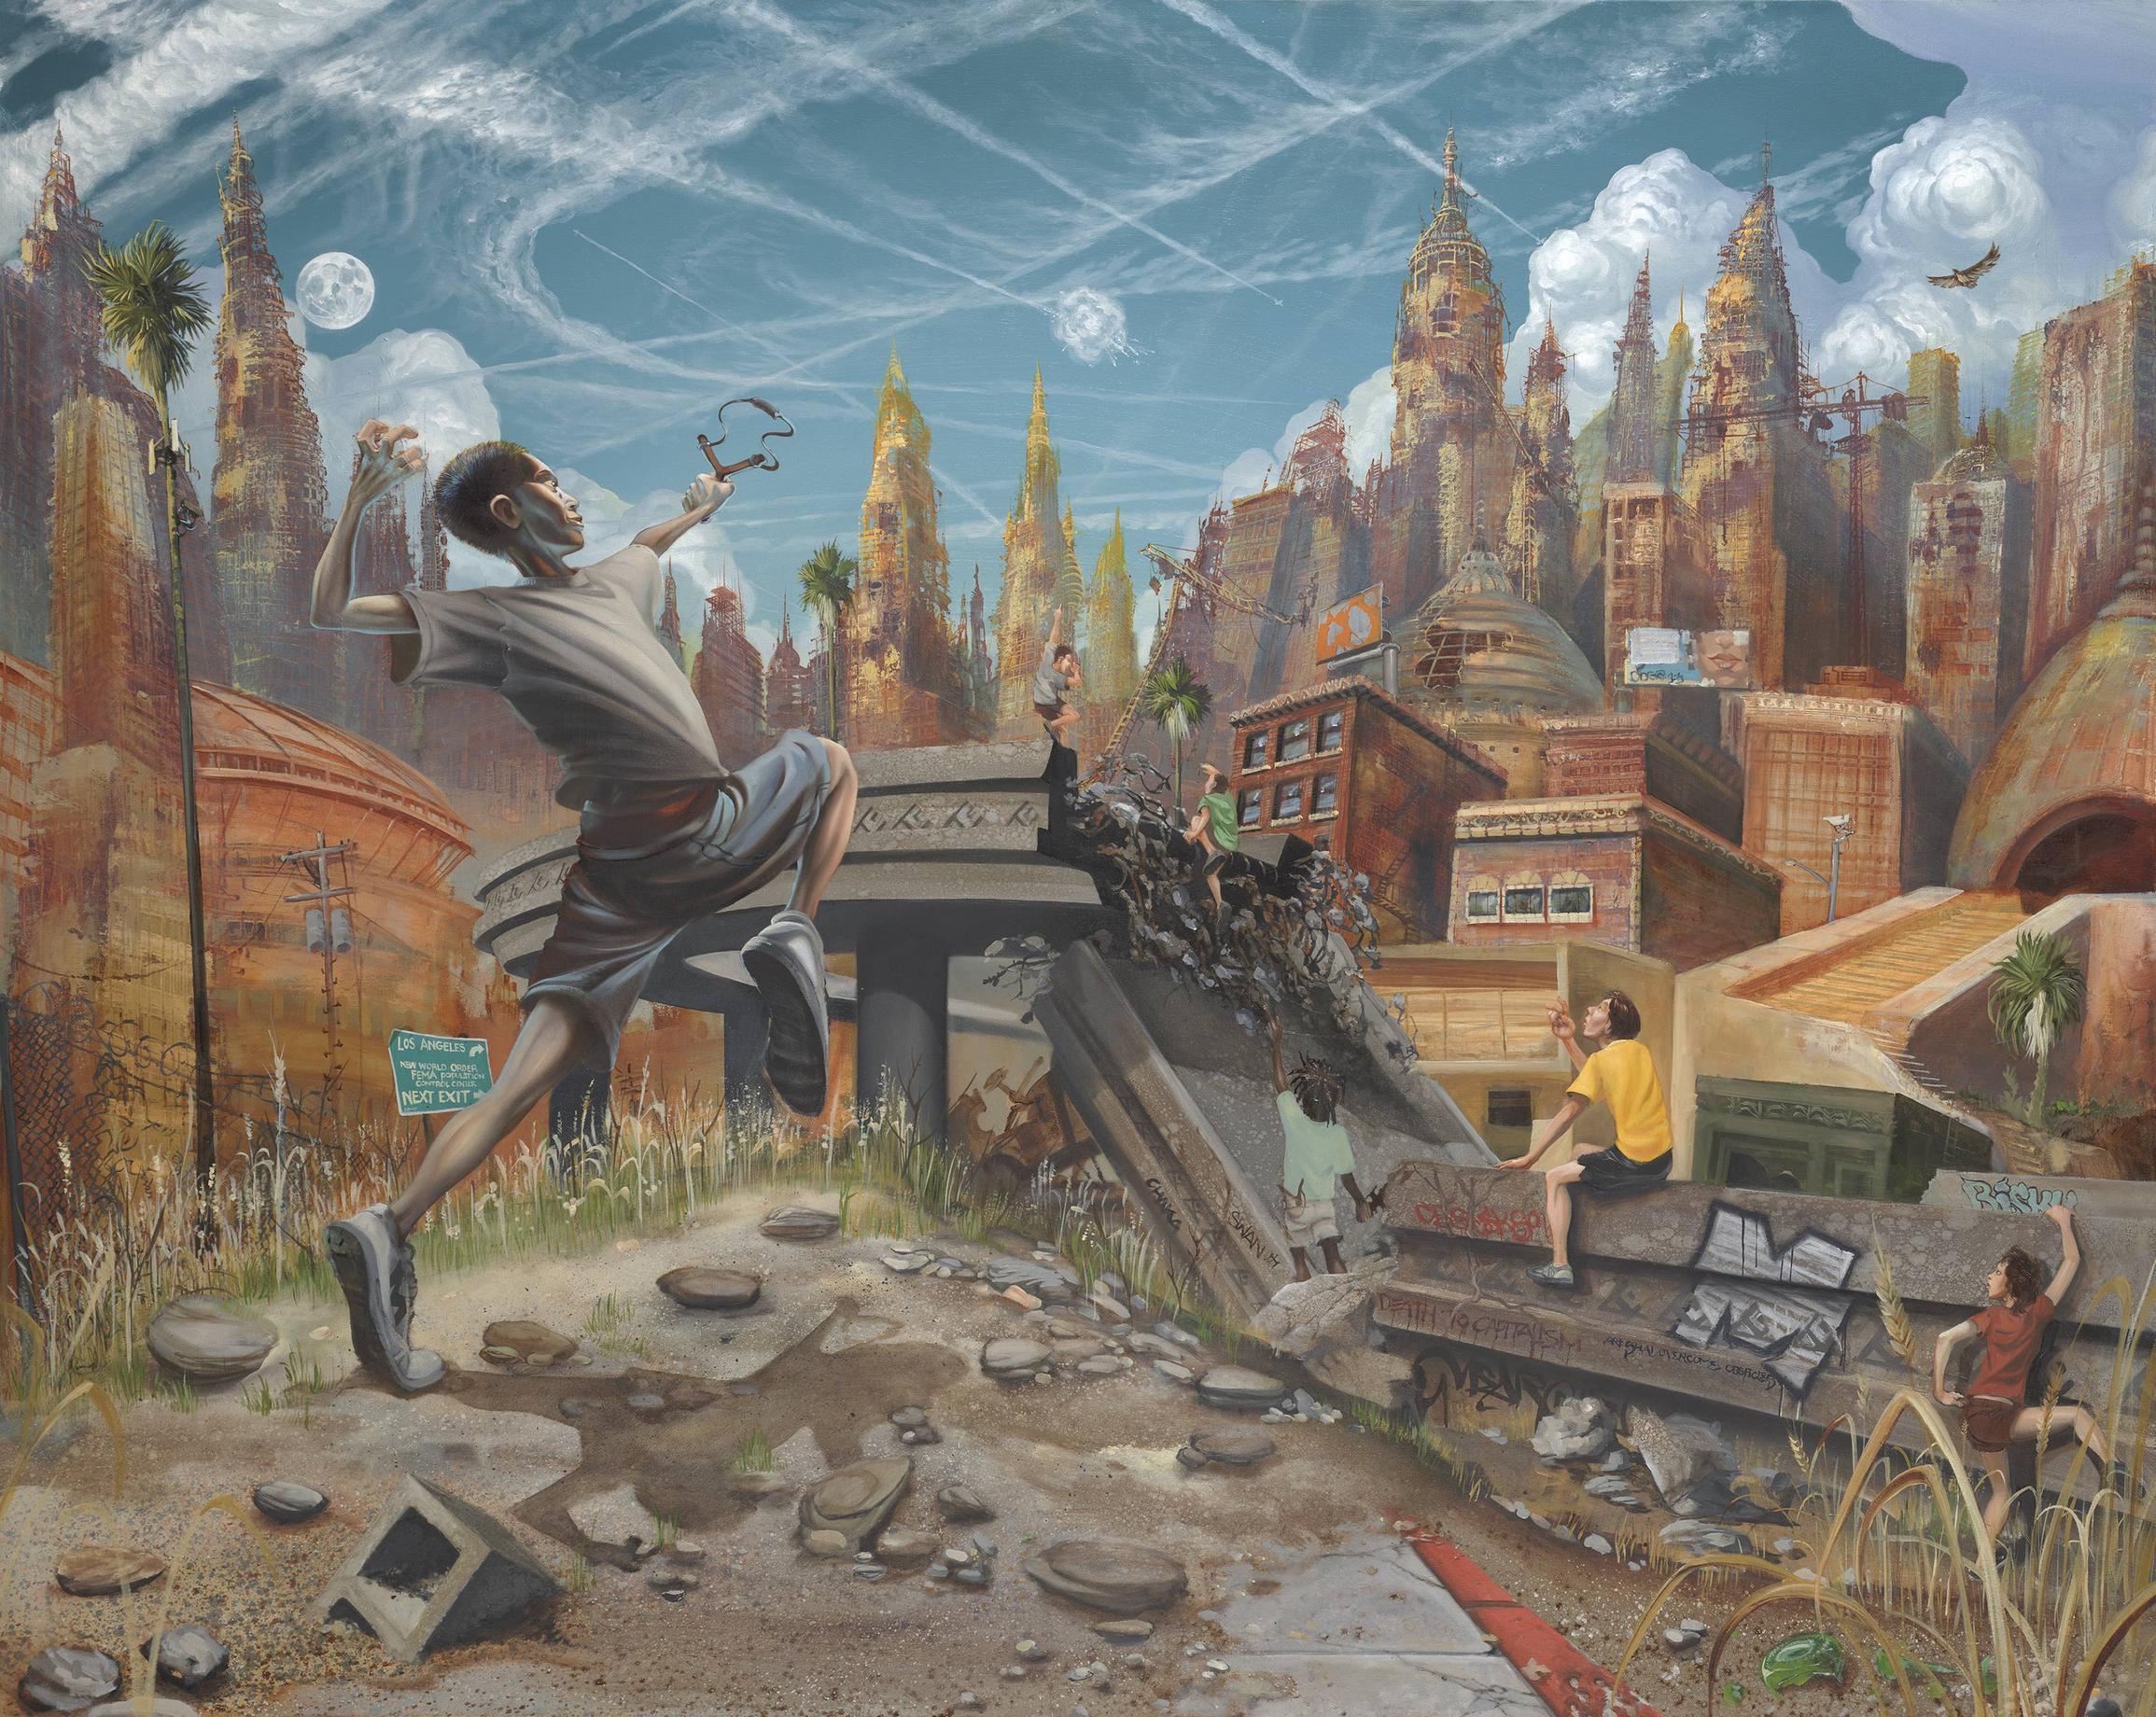 Freeport - David & Goliath 19/100